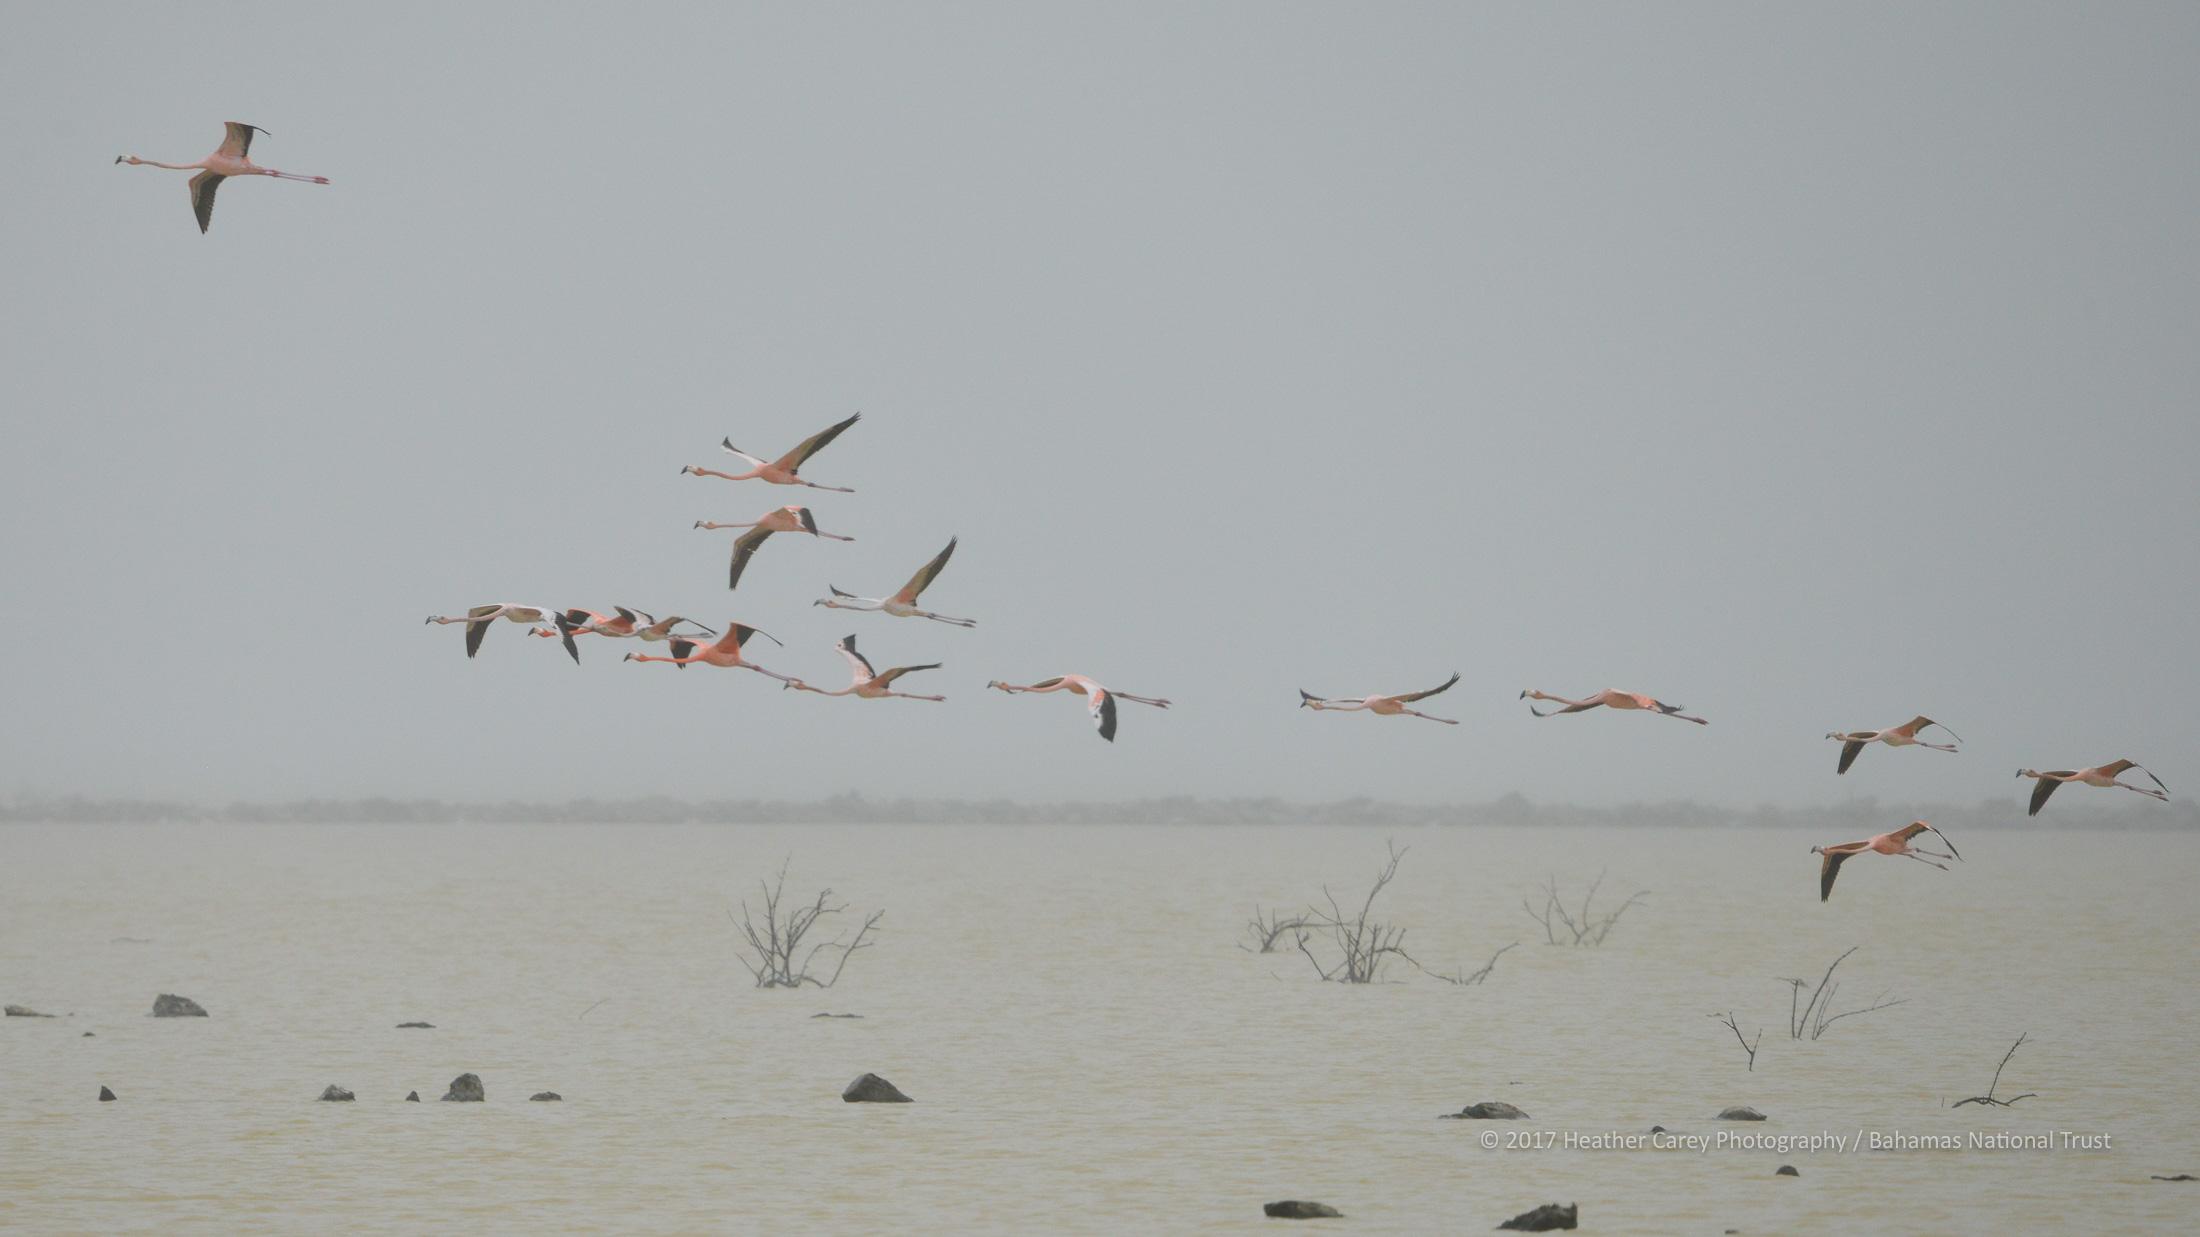 flamingo inagua national park